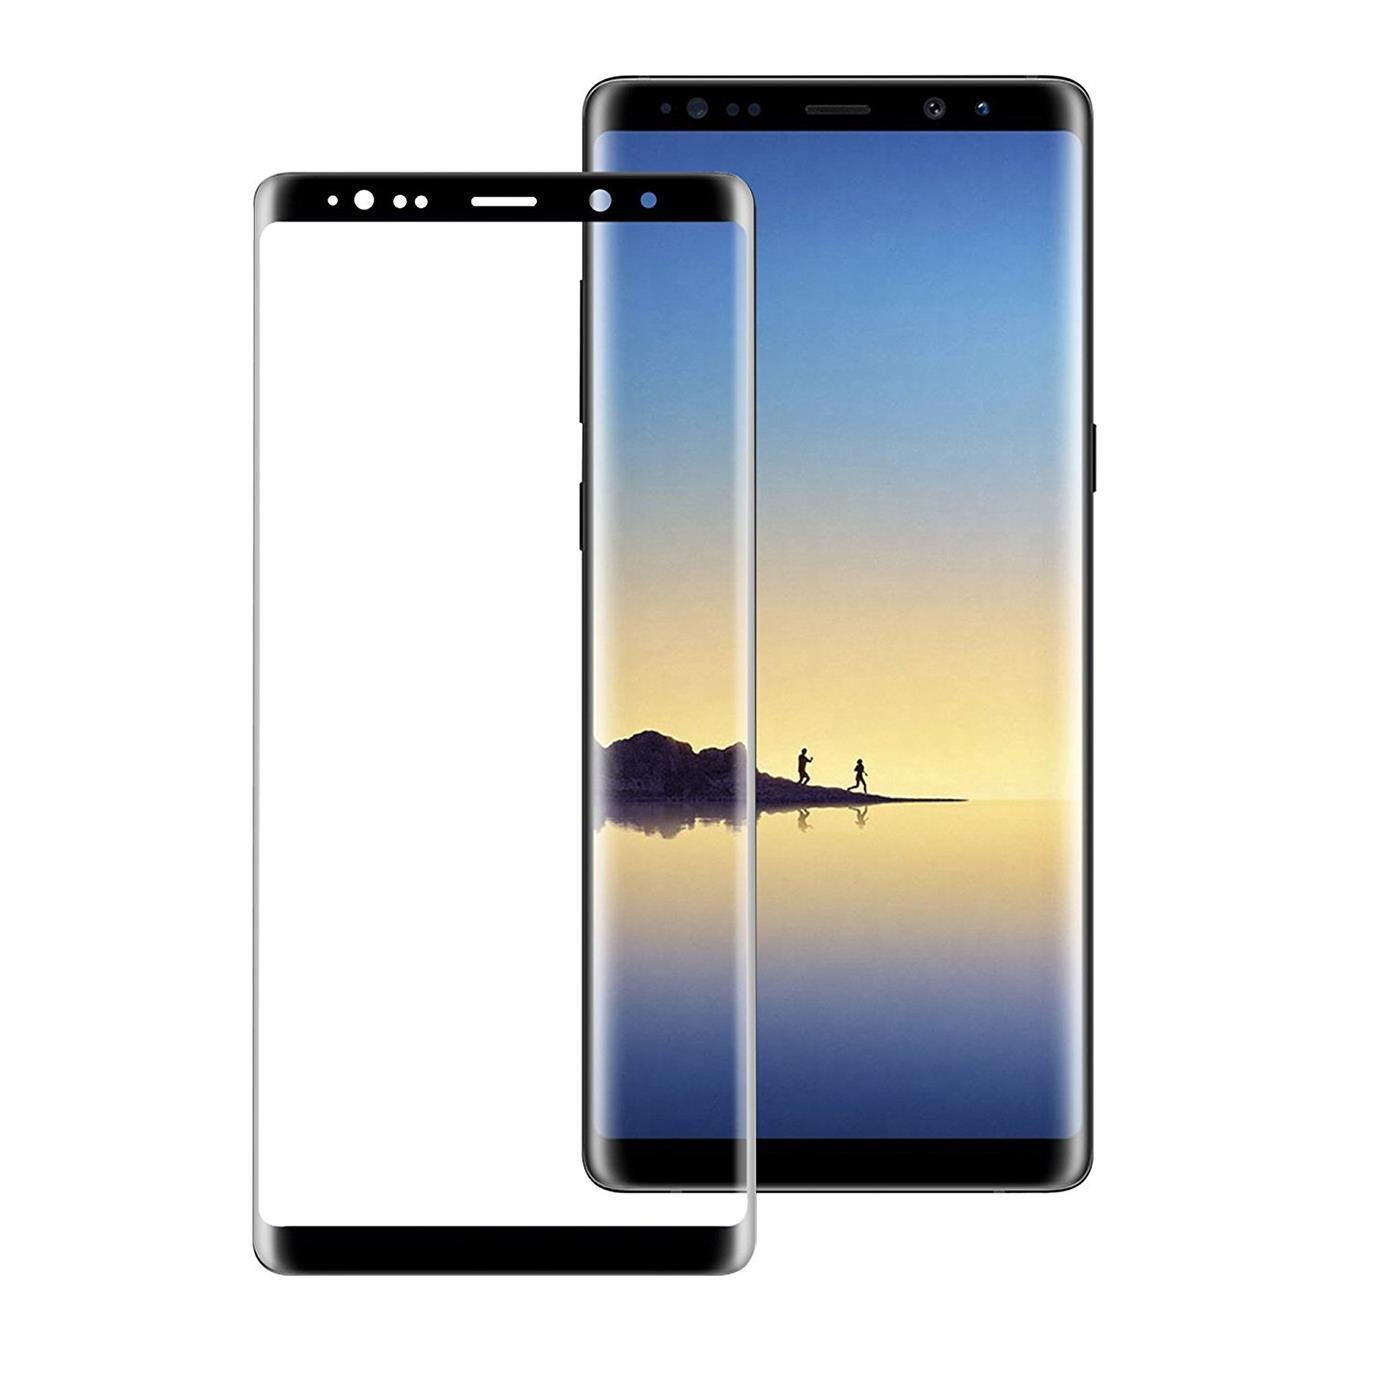 Samsung Galaxy Note 8 Panzerglas komplett Abdeckung Amazon Elektronik